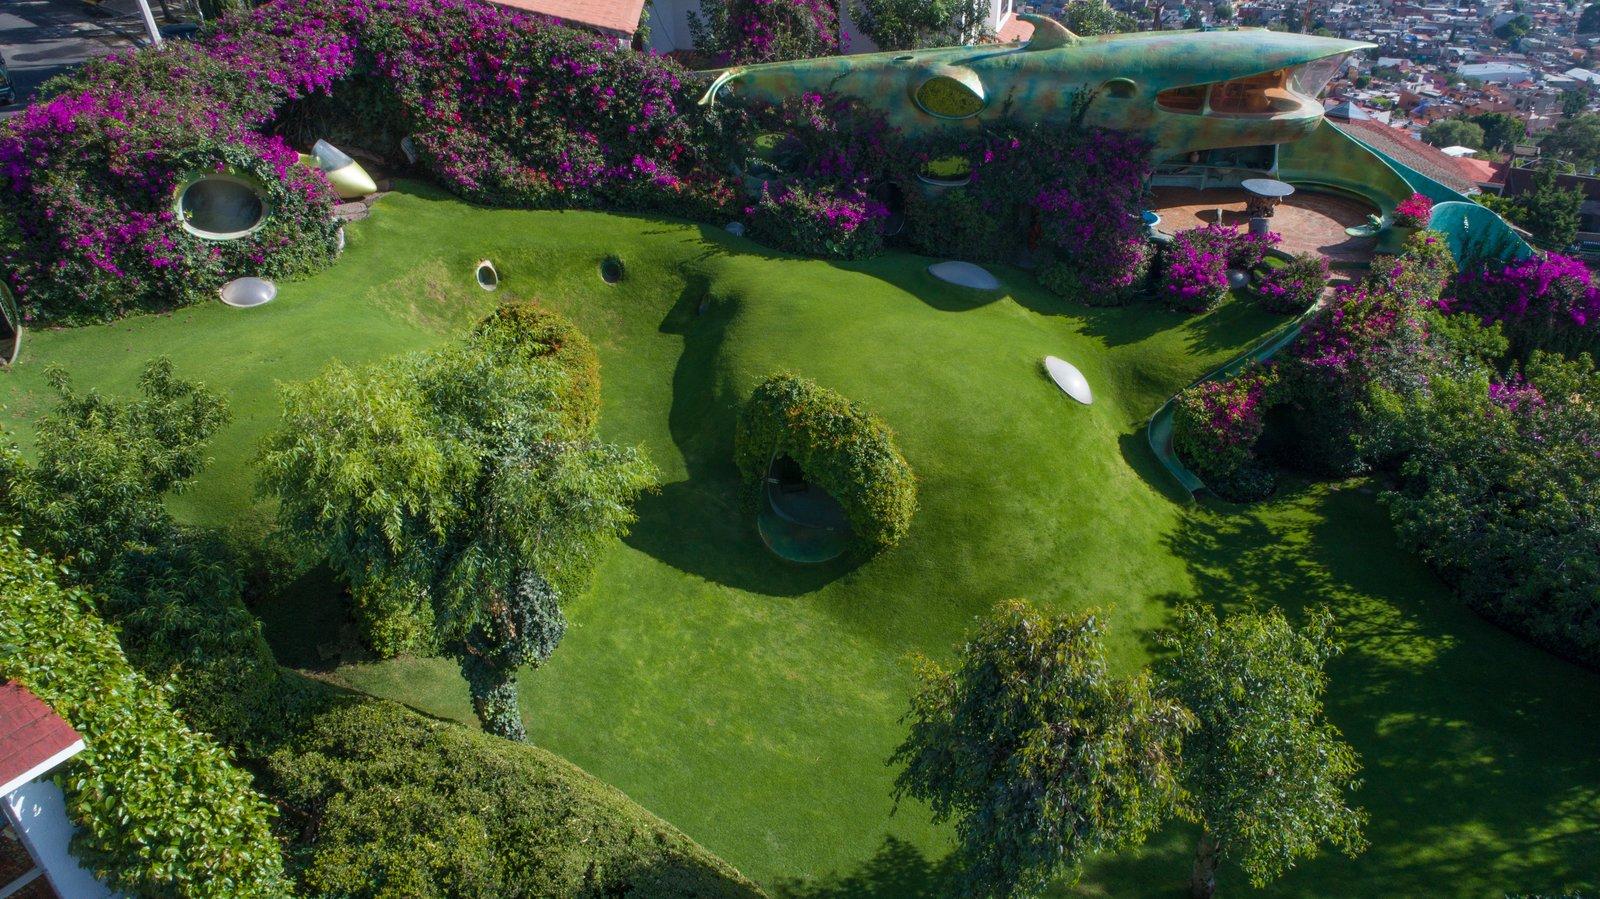 Organic House underground home aerial view